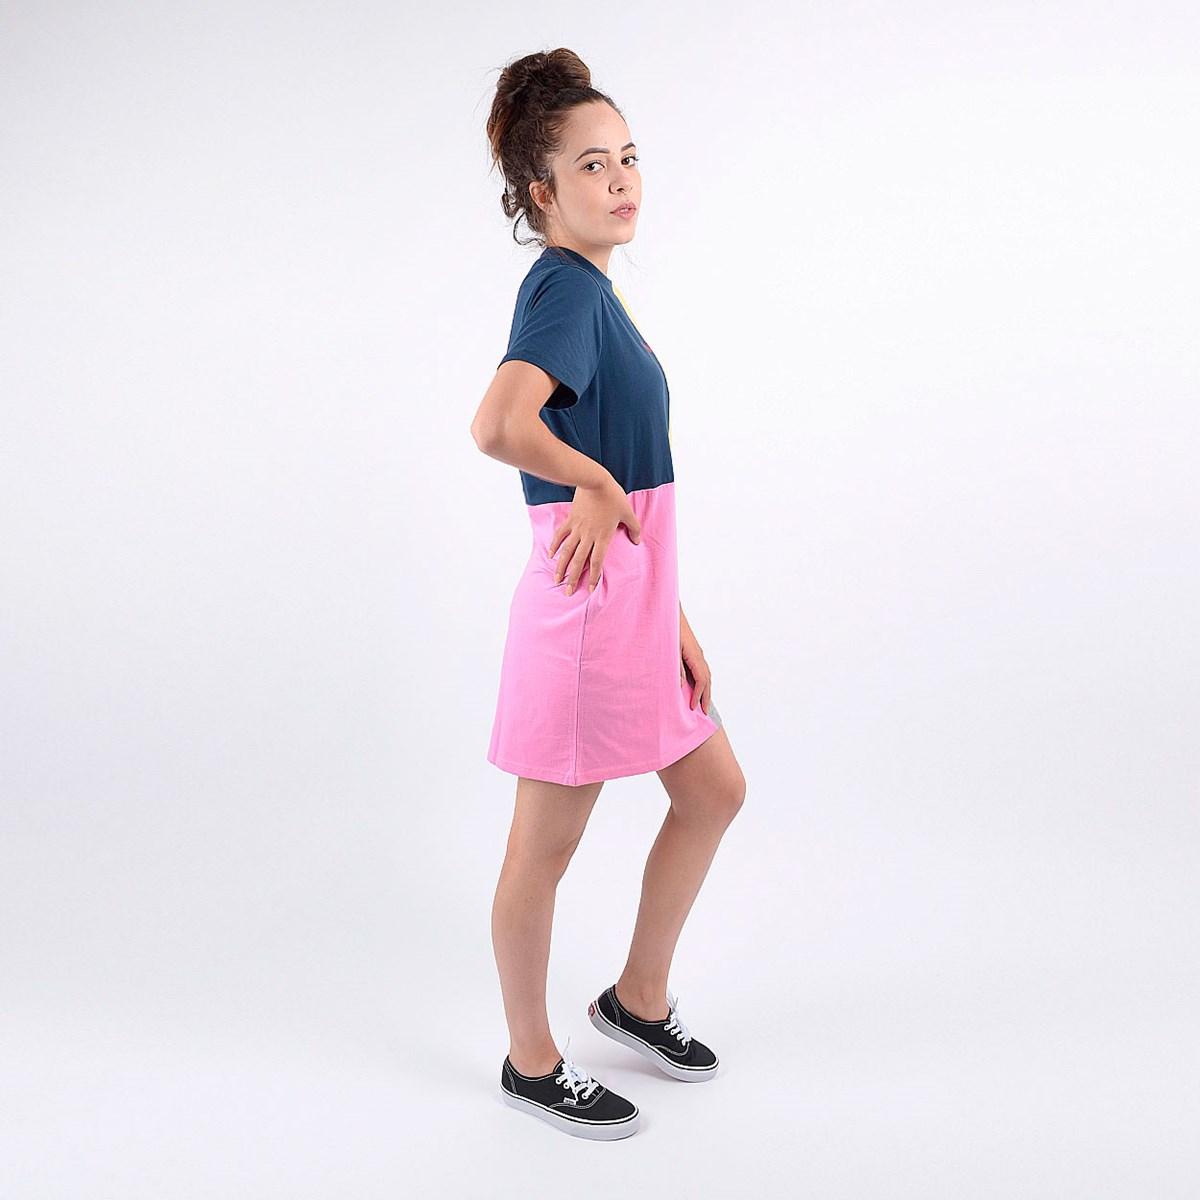 Vestido Vans Feminino Check Piece Dress Blues Checkwork VN0A4DQRVDJ